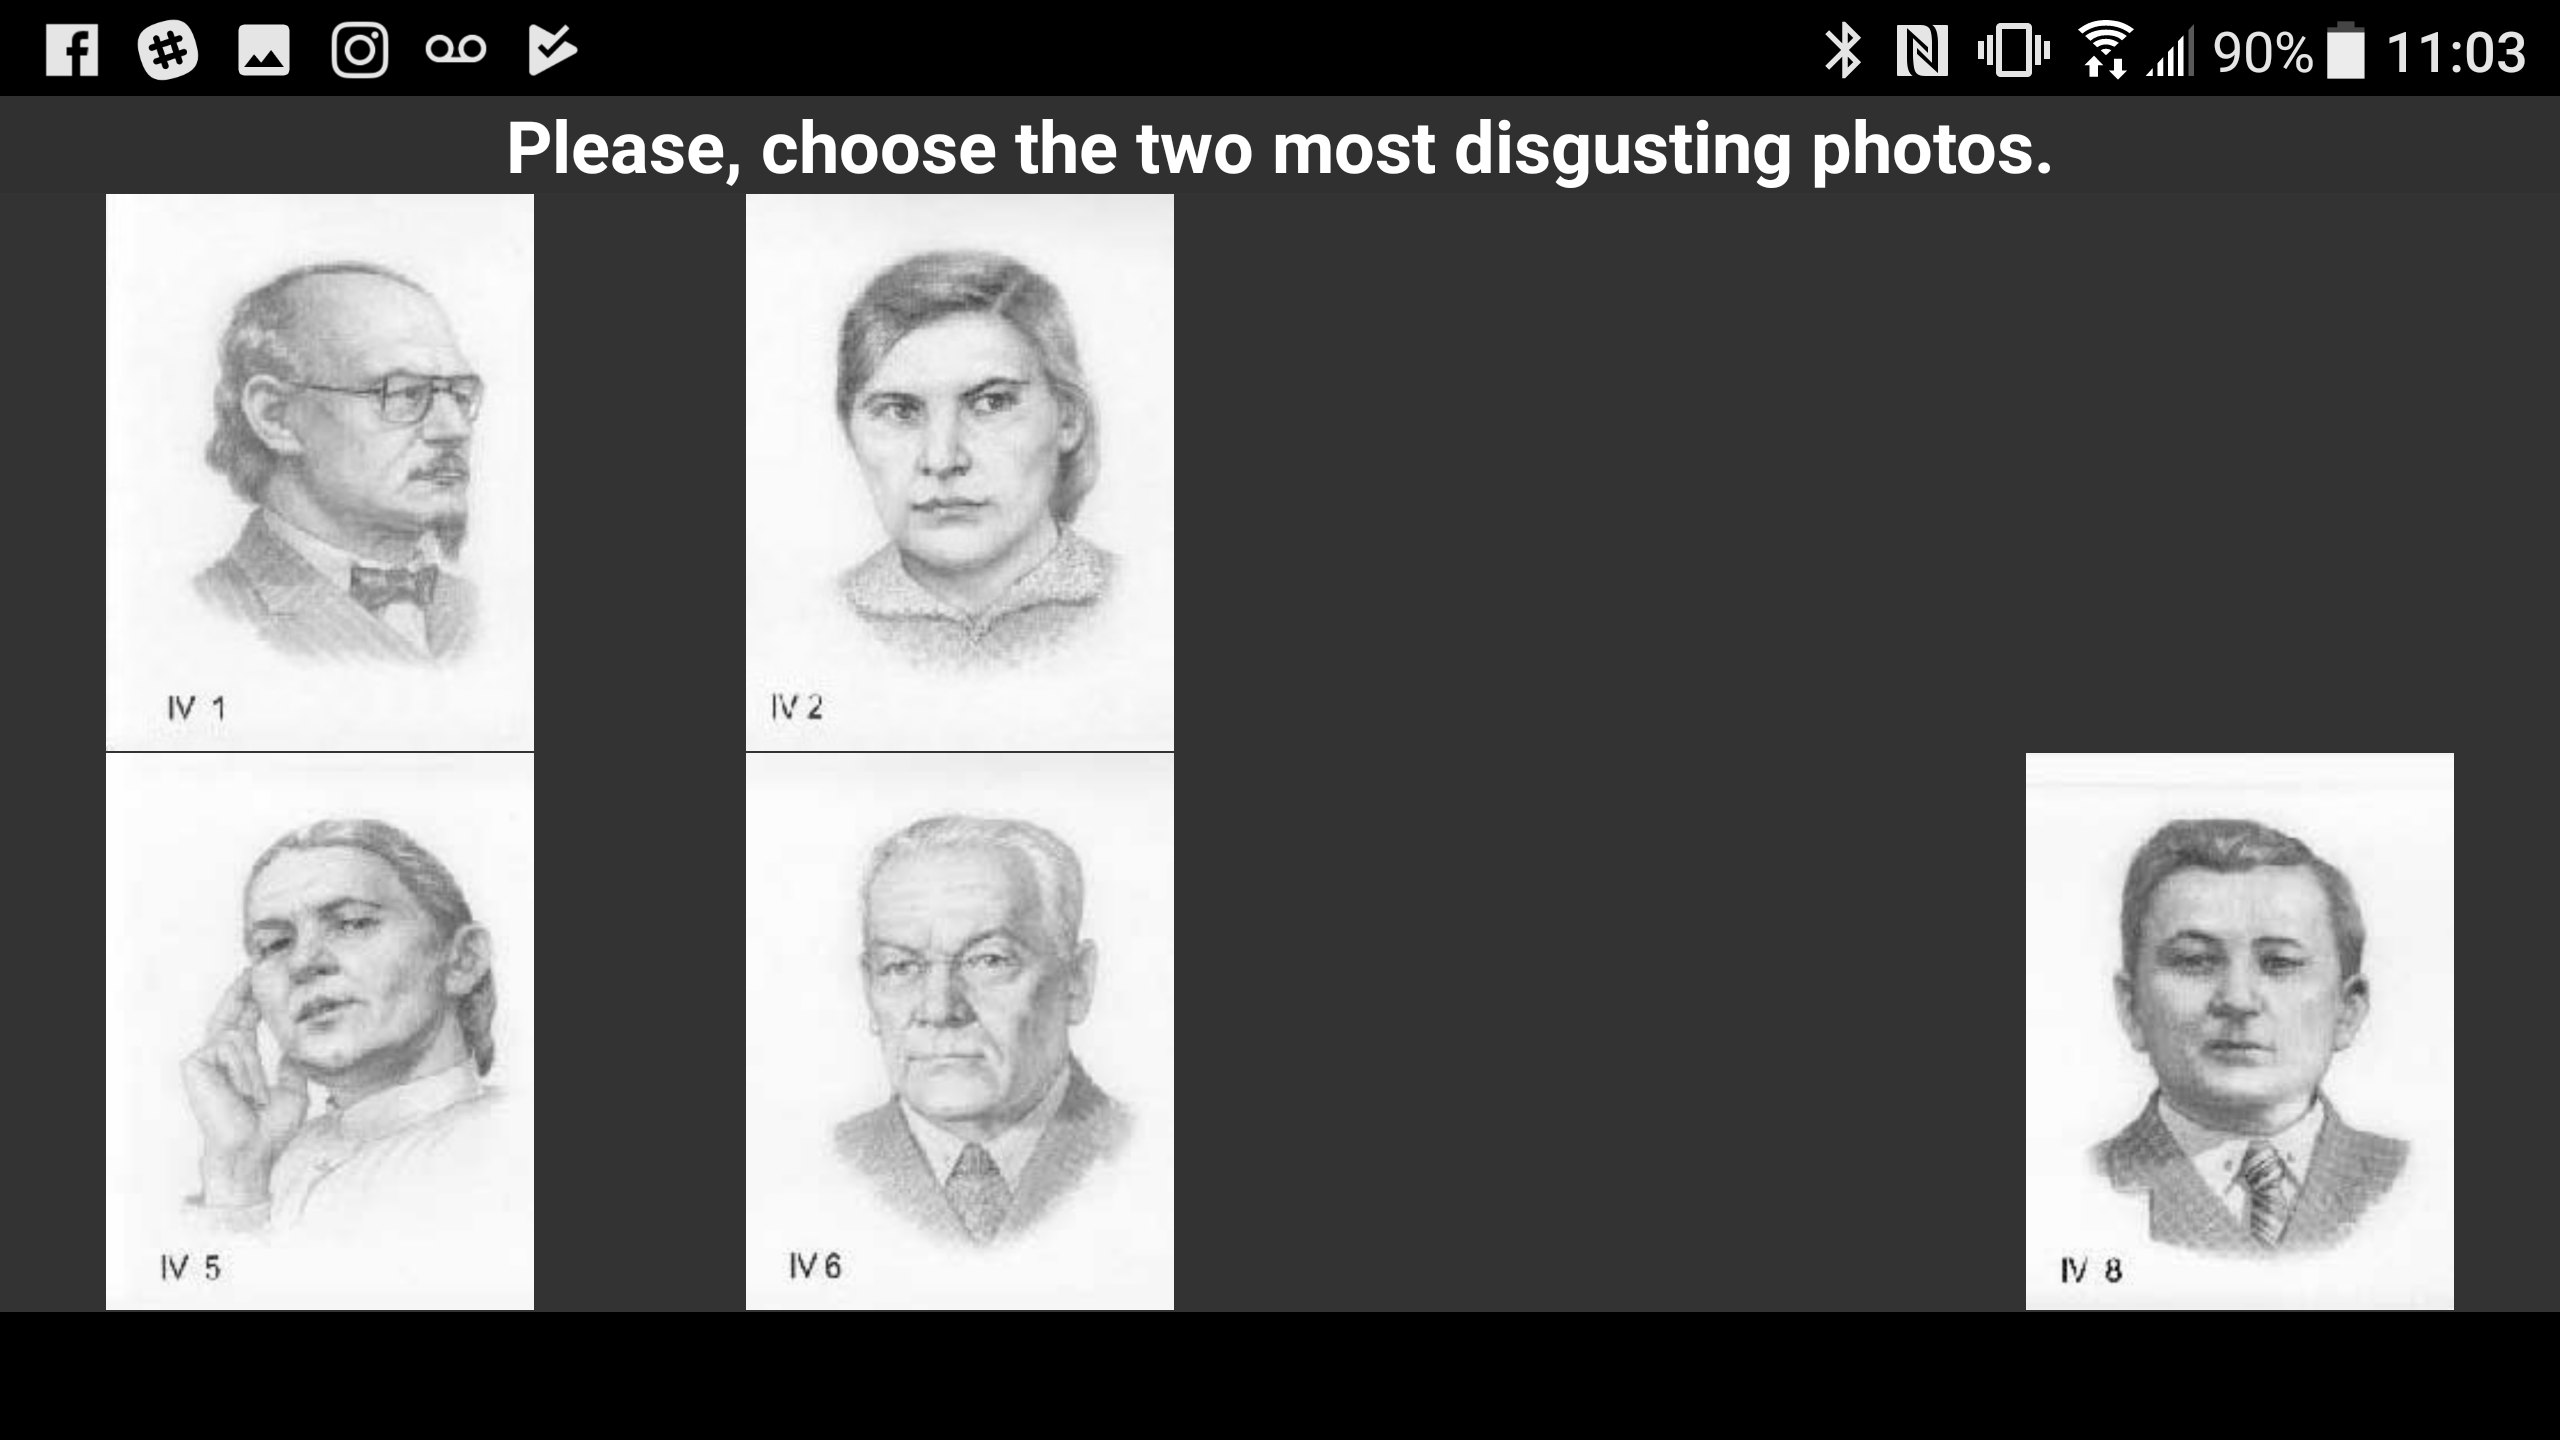 hidden personality app psychopaths disgusting